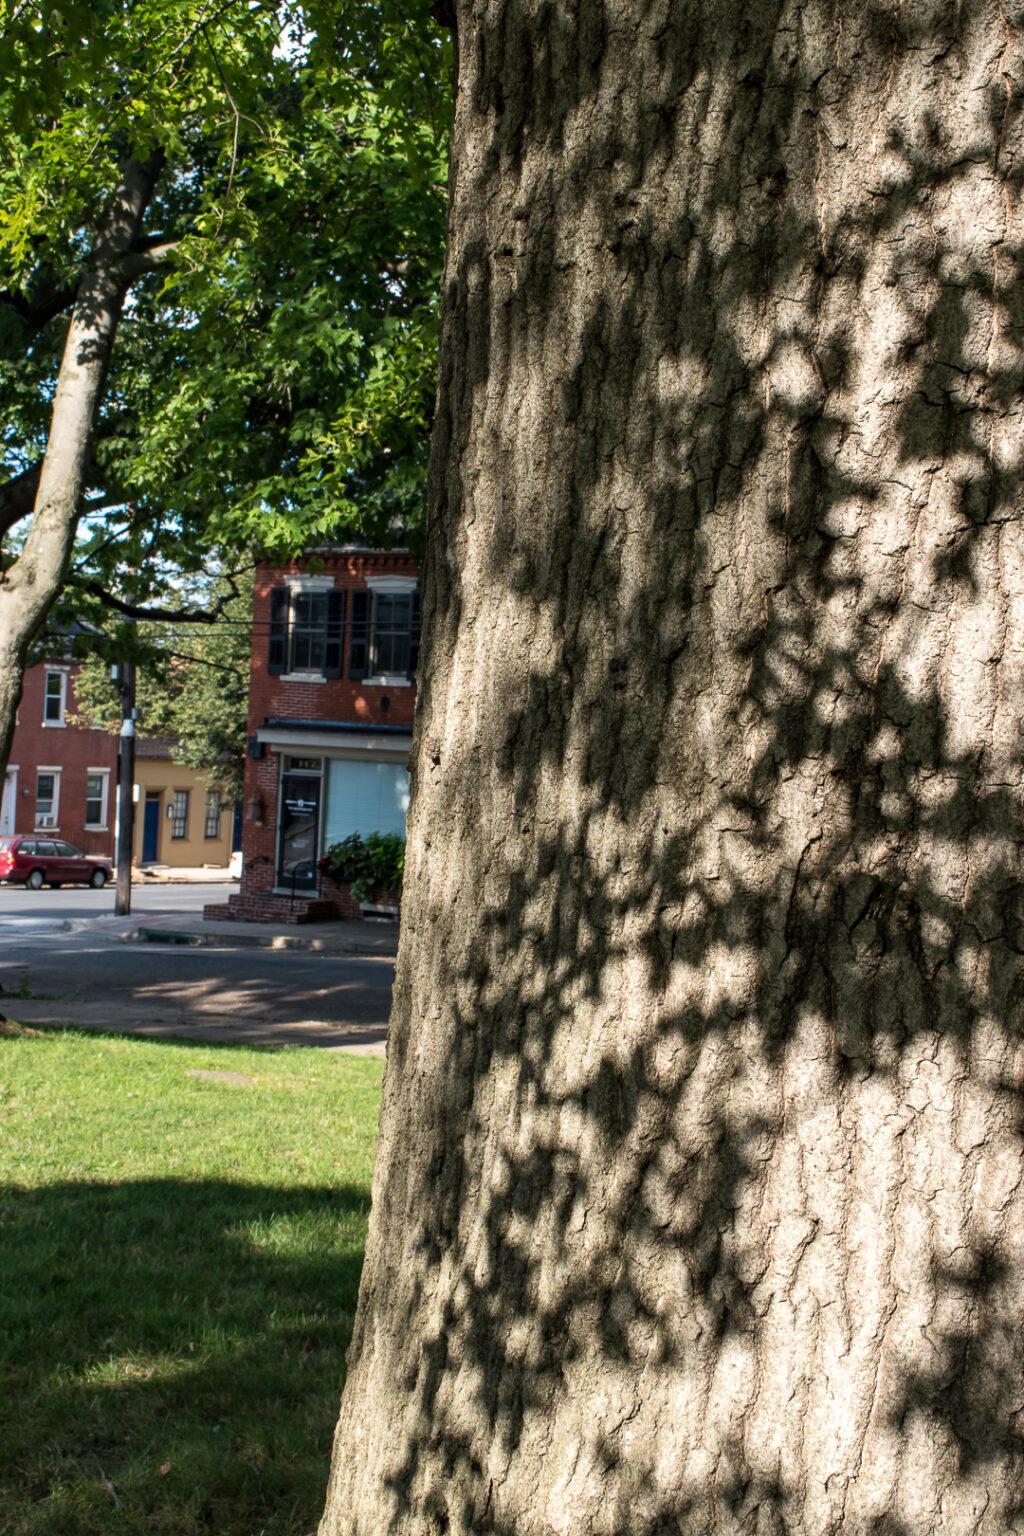 Plant shadows on a tree trunk